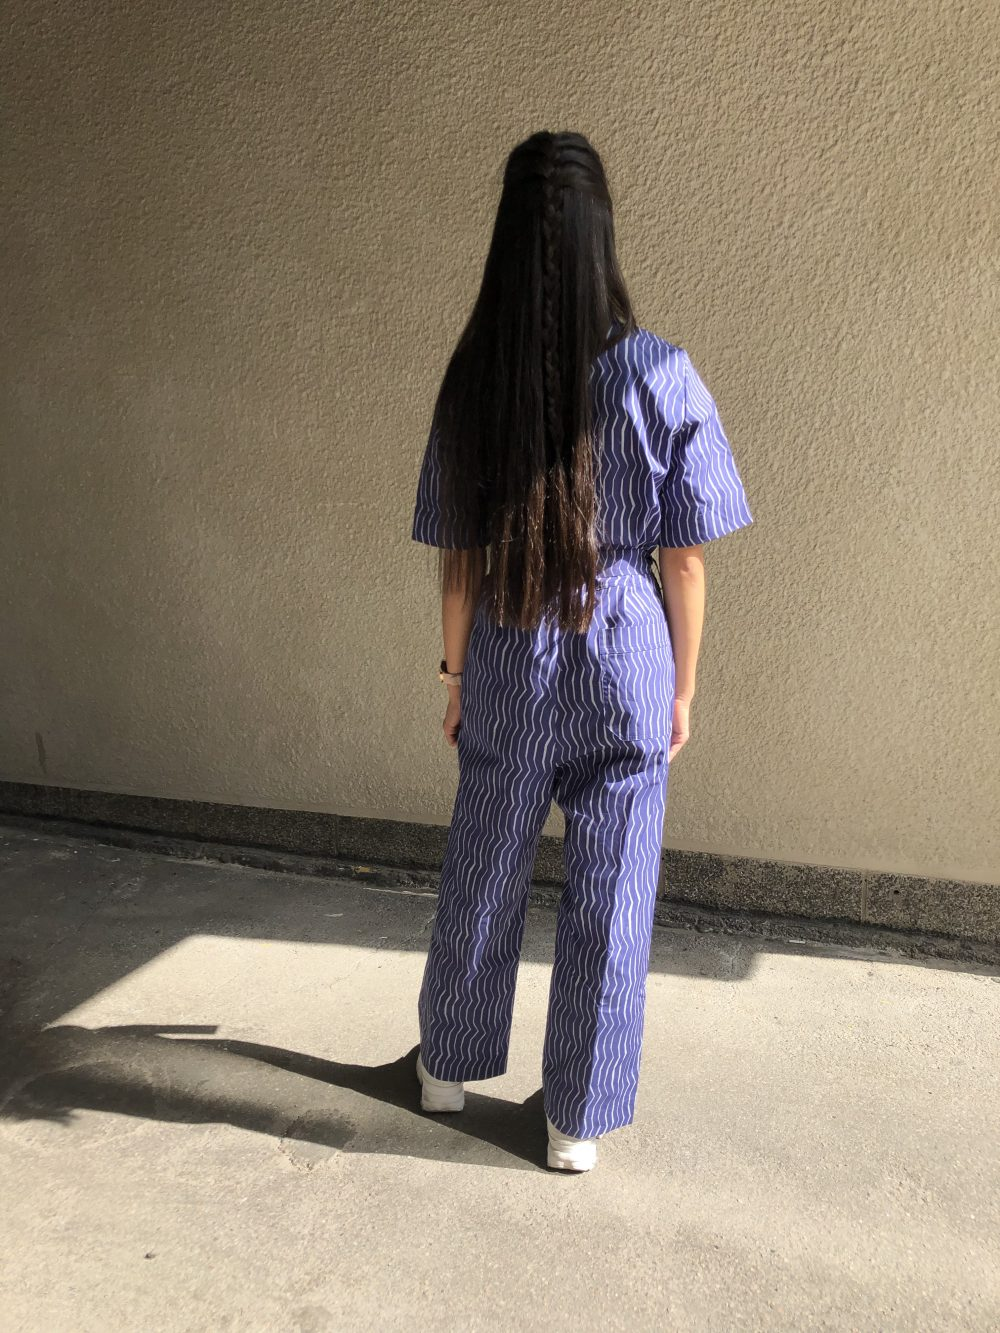 Vimma Jumpsuit HARRI one-colored dark blue S-L - dark blue, HARRI, Jumpsuit, one-colored, S-L